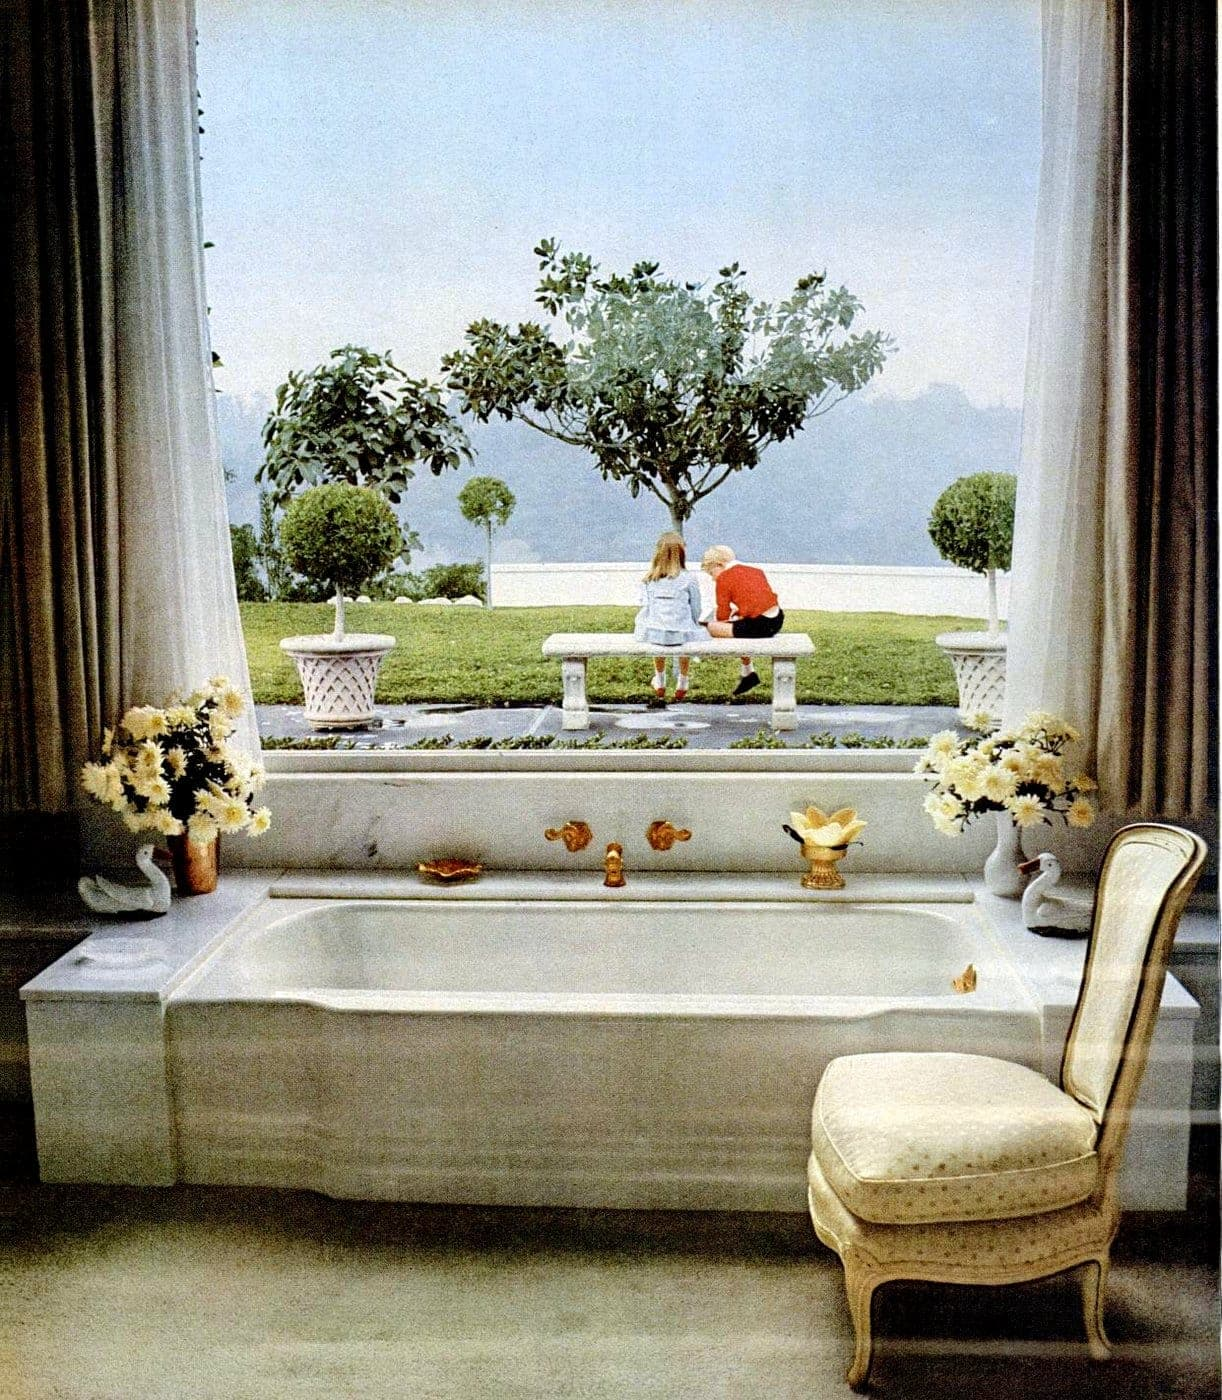 60 vintage '60s bathrooms for retro home decor ideas & inspiration